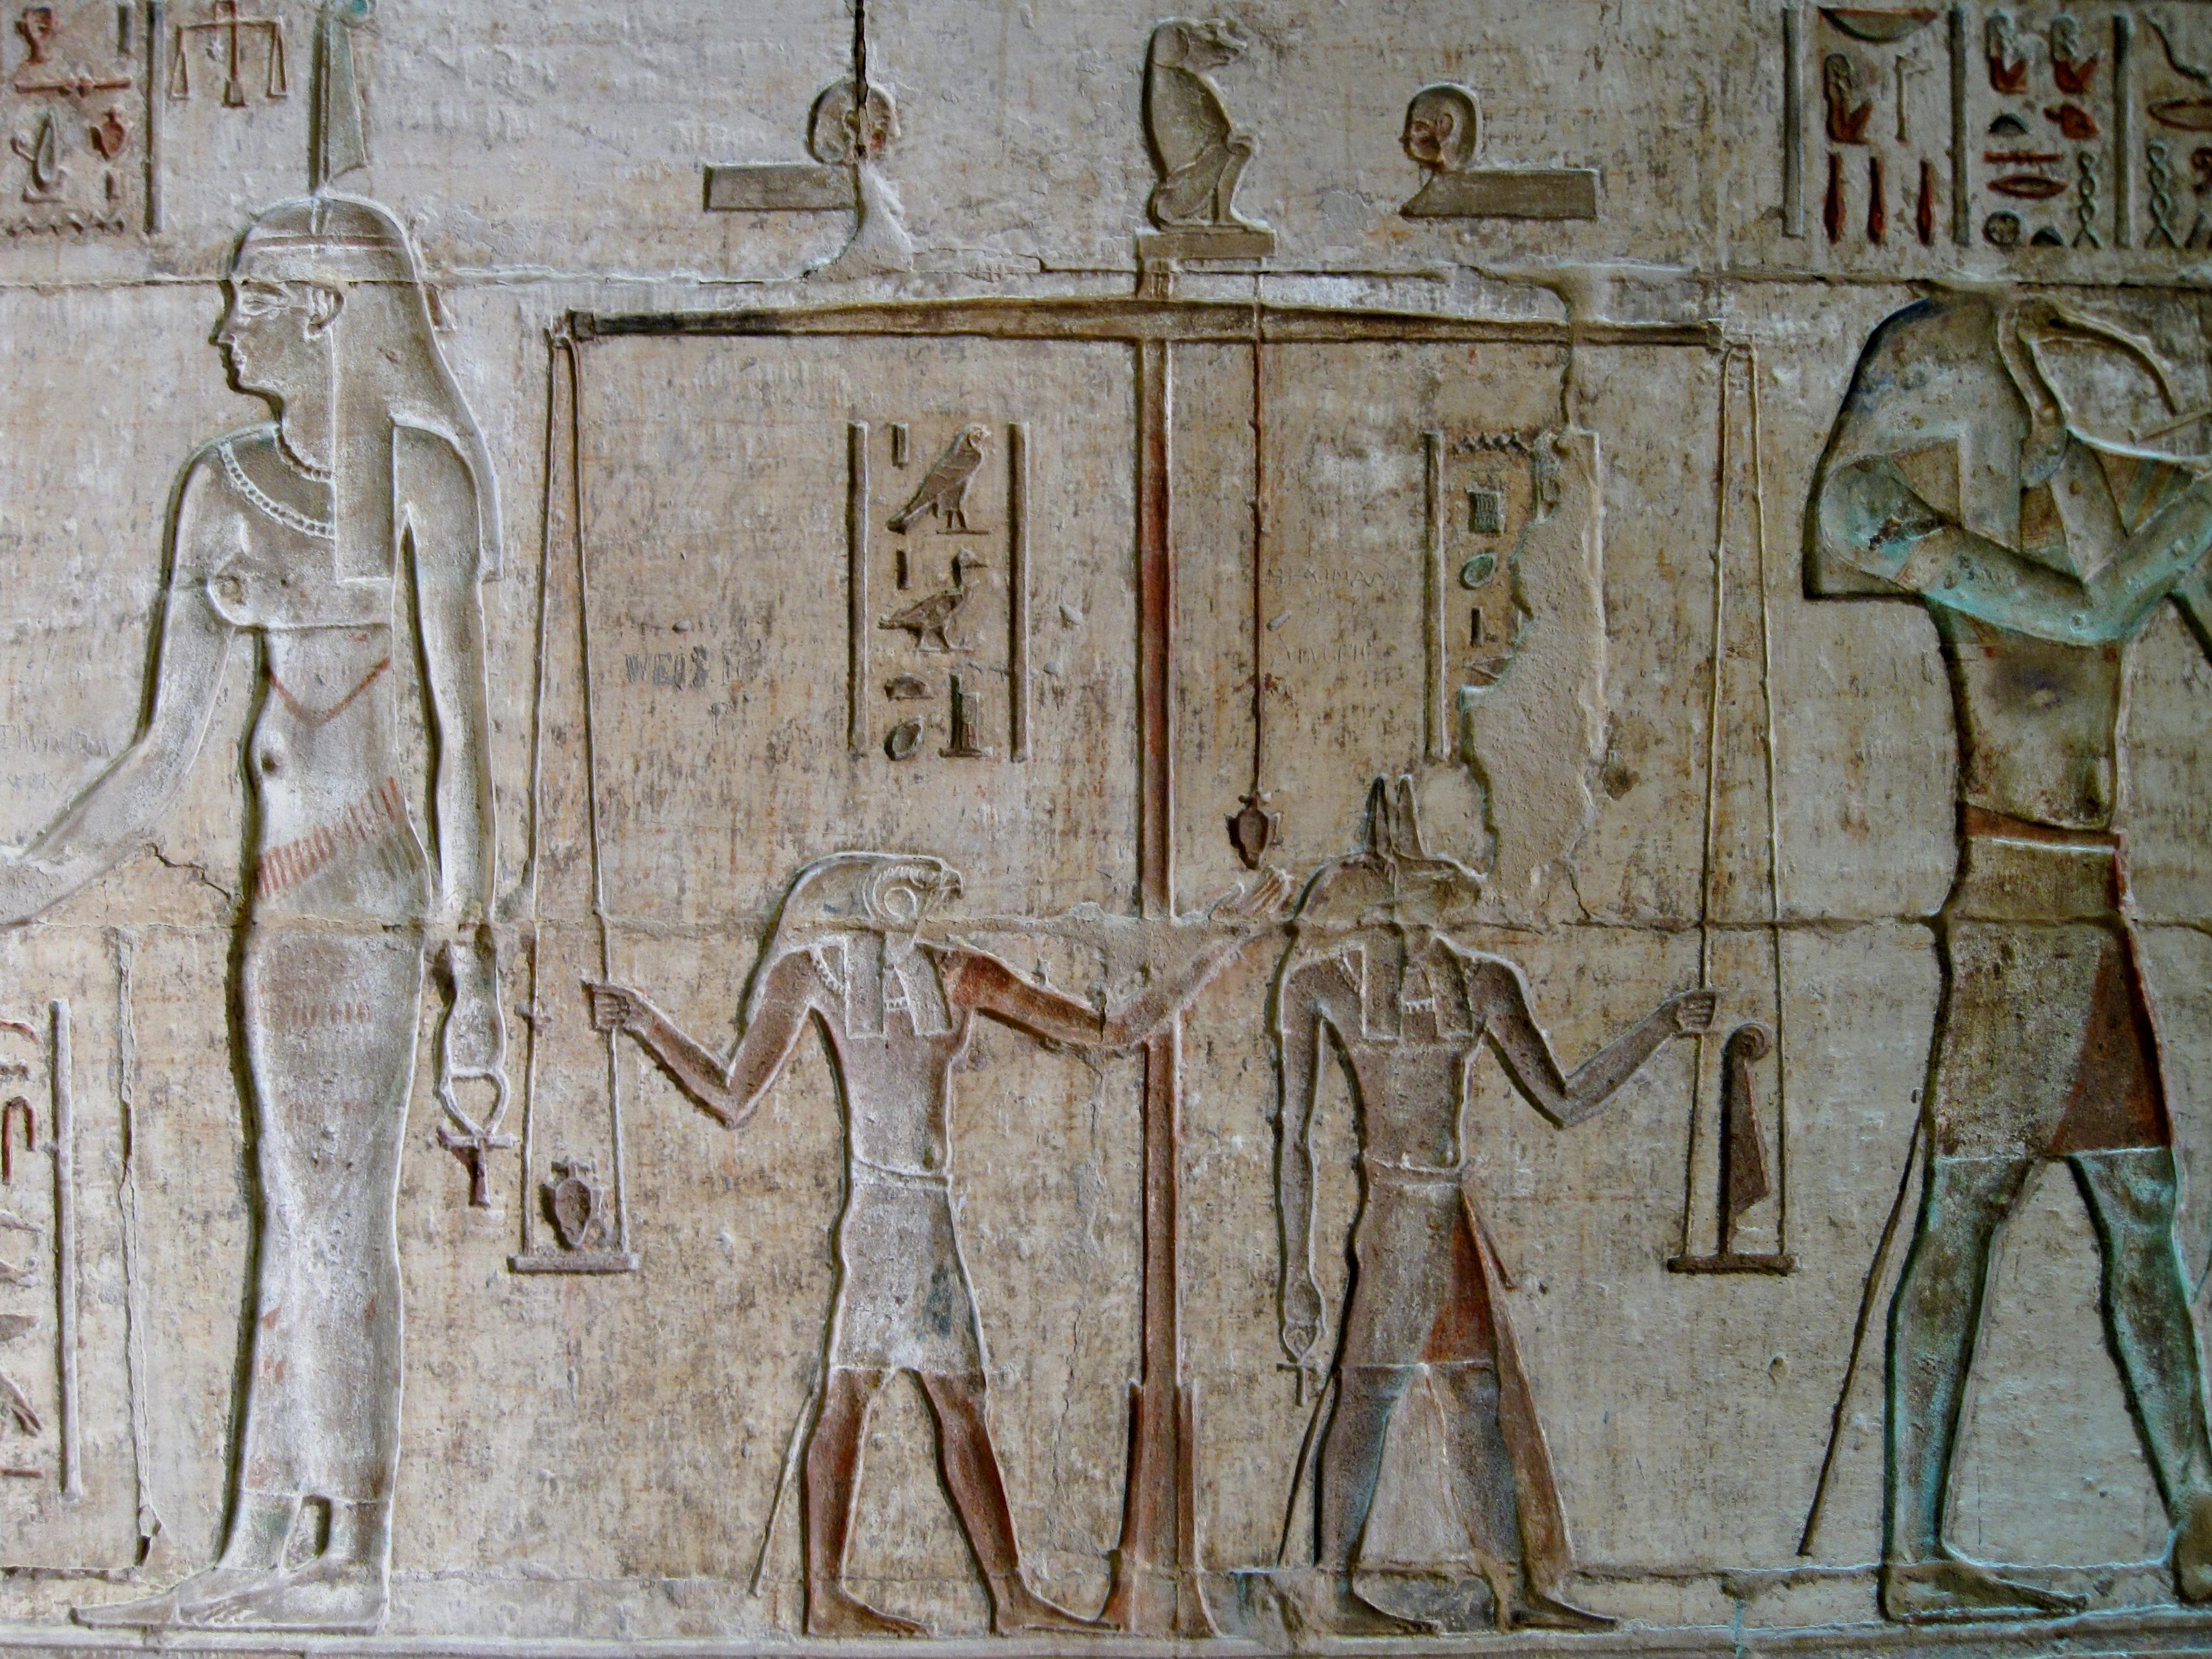 http://upload.wikimedia.org/wikipedia/commons/2/27/Temple_of_Deir_el-Medina_20.JPG